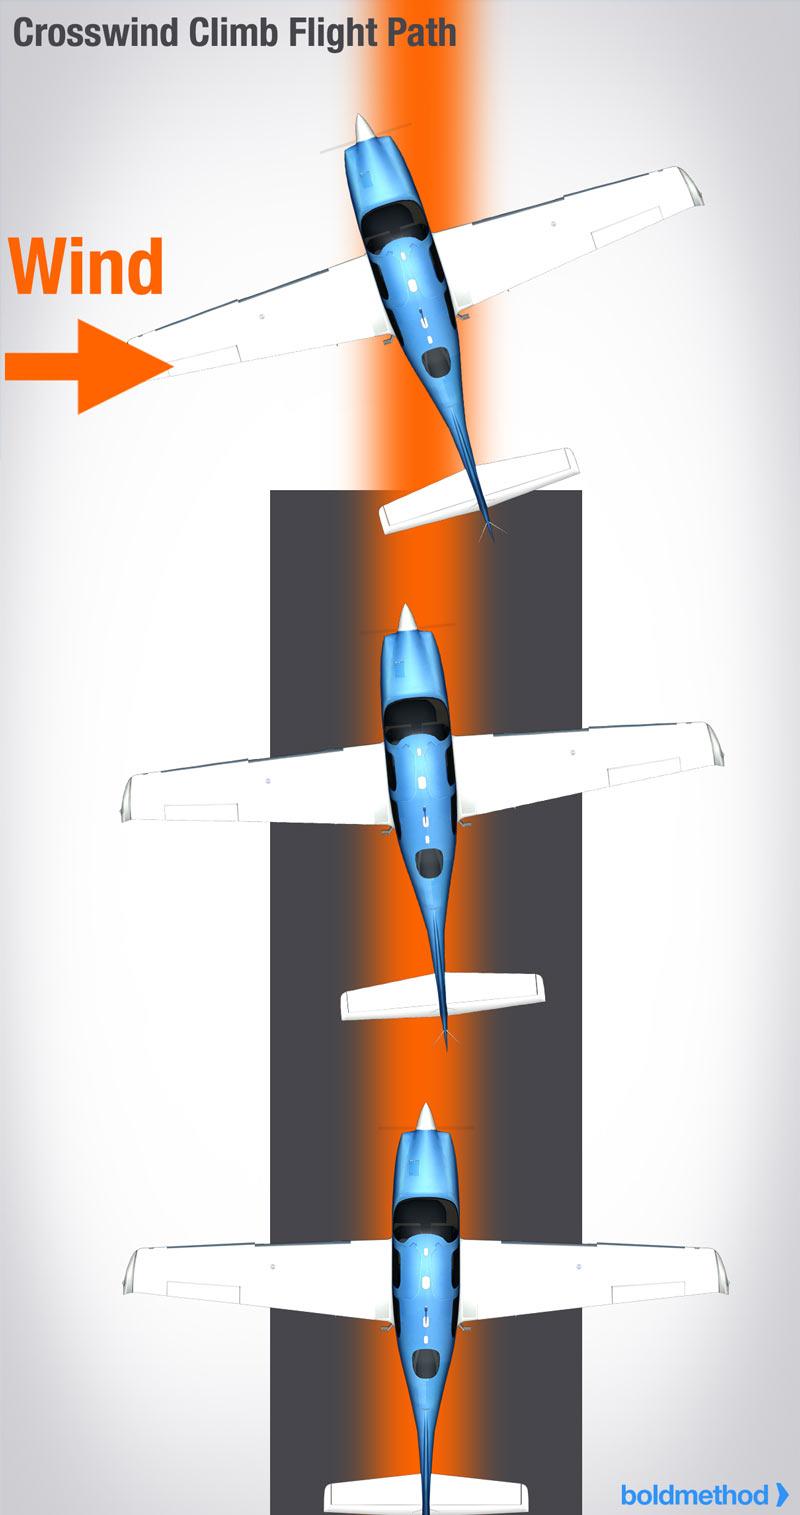 How To Make A Perfect Crosswind Takeoff | Boldmethod